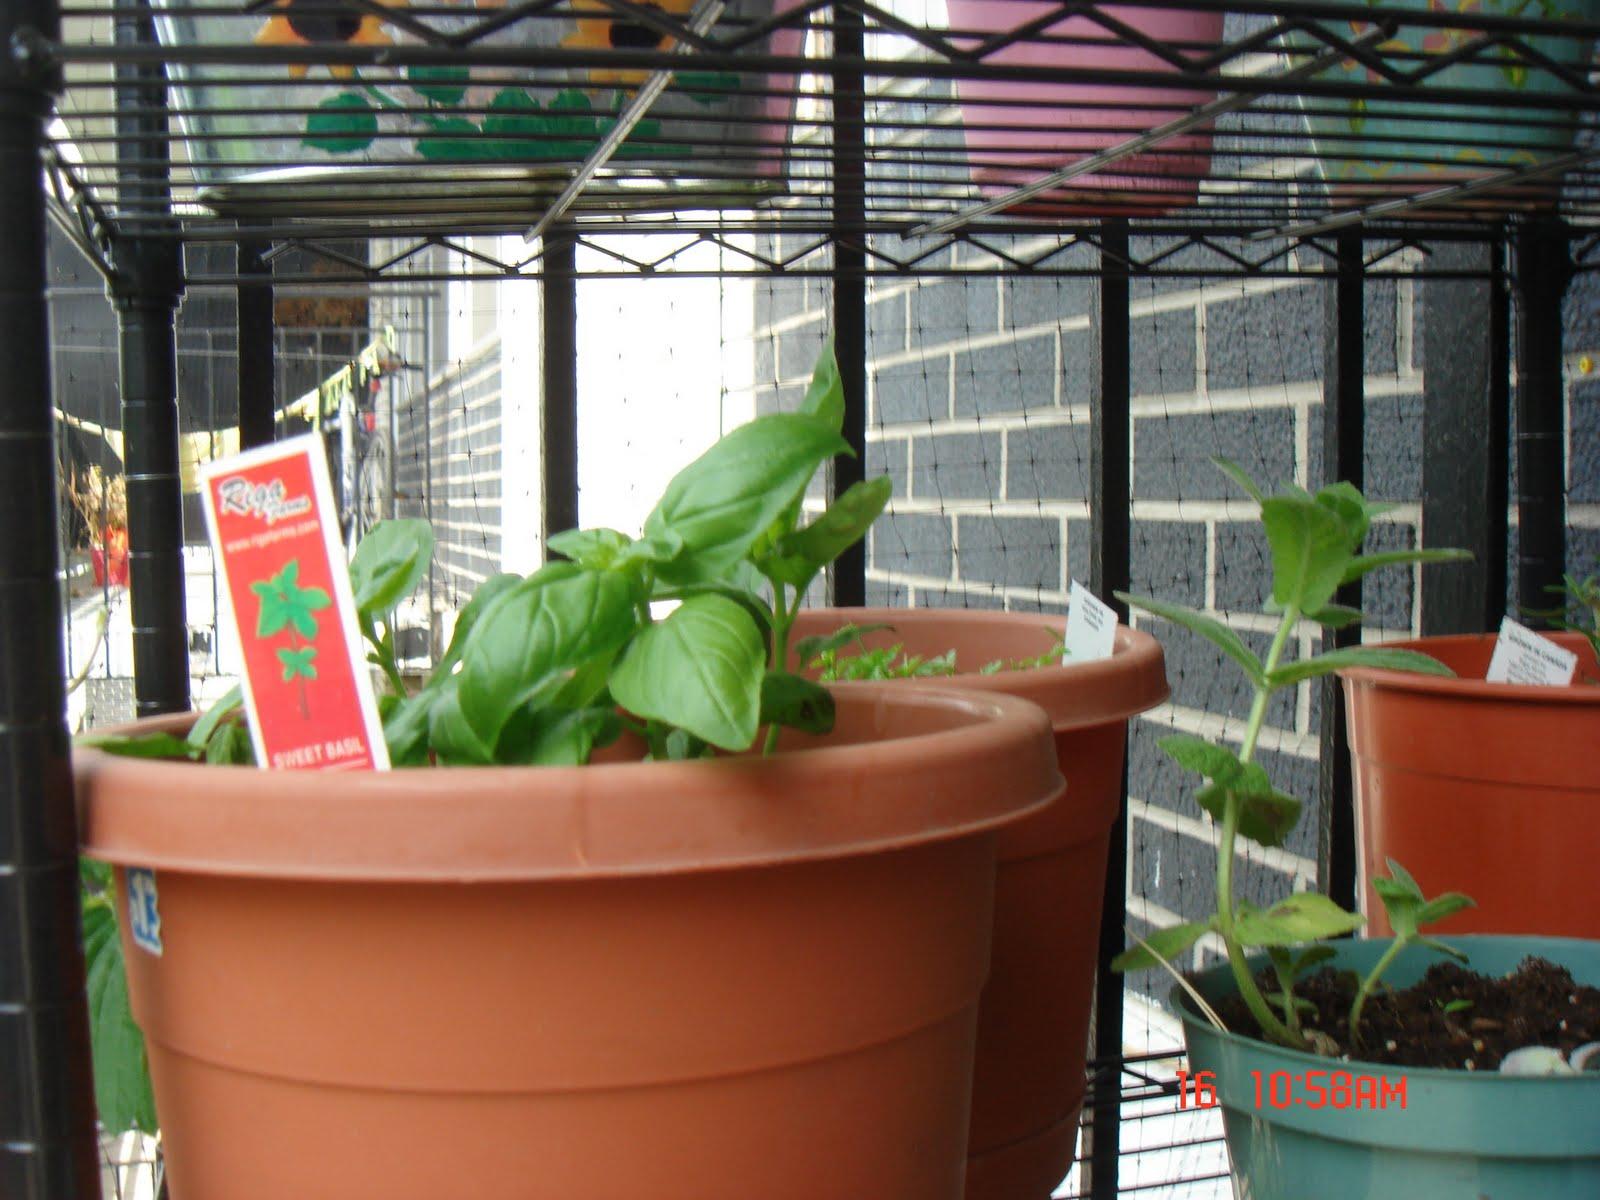 gunksdesigns vegetable garden on my balcony